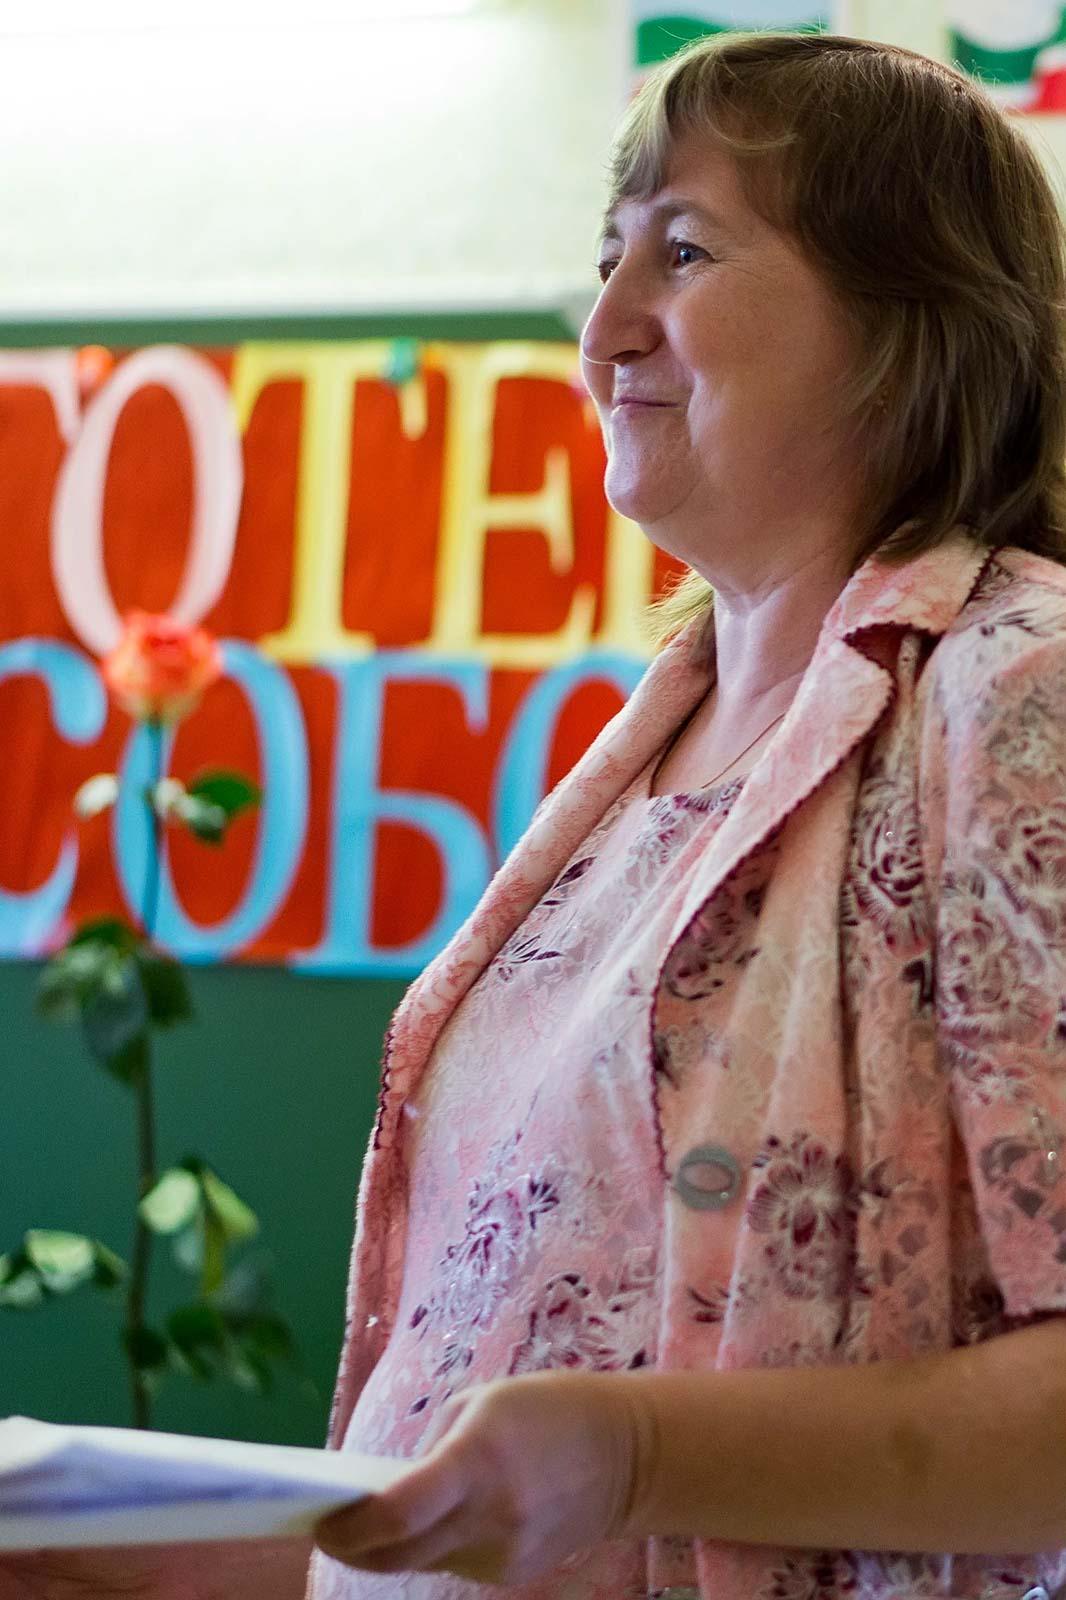 Фото №106900. Елена Юрьевна Кильдюшева , секретарь ЛИТО «Белое перо»